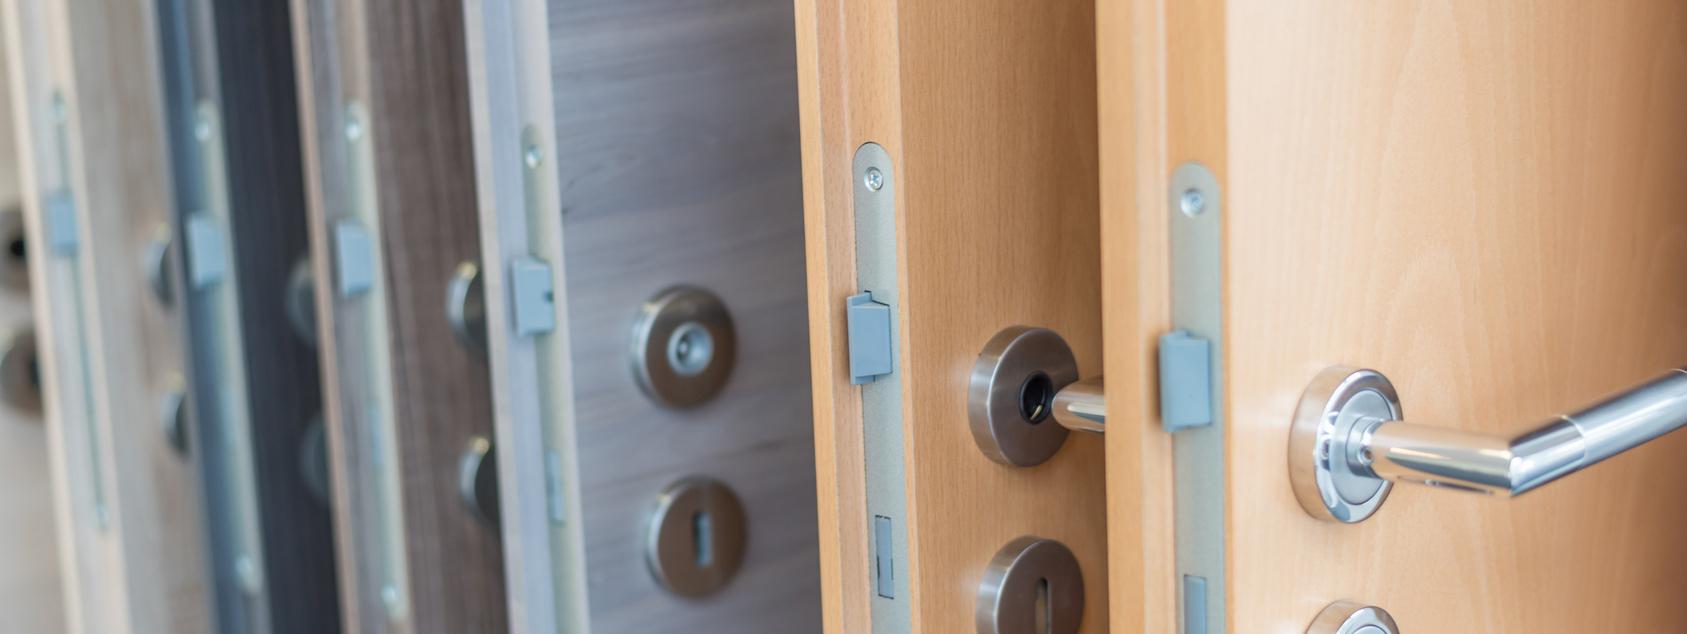 Baumarkt türen  Baumarkt Wittig » Sortiment » Fenster & Türen